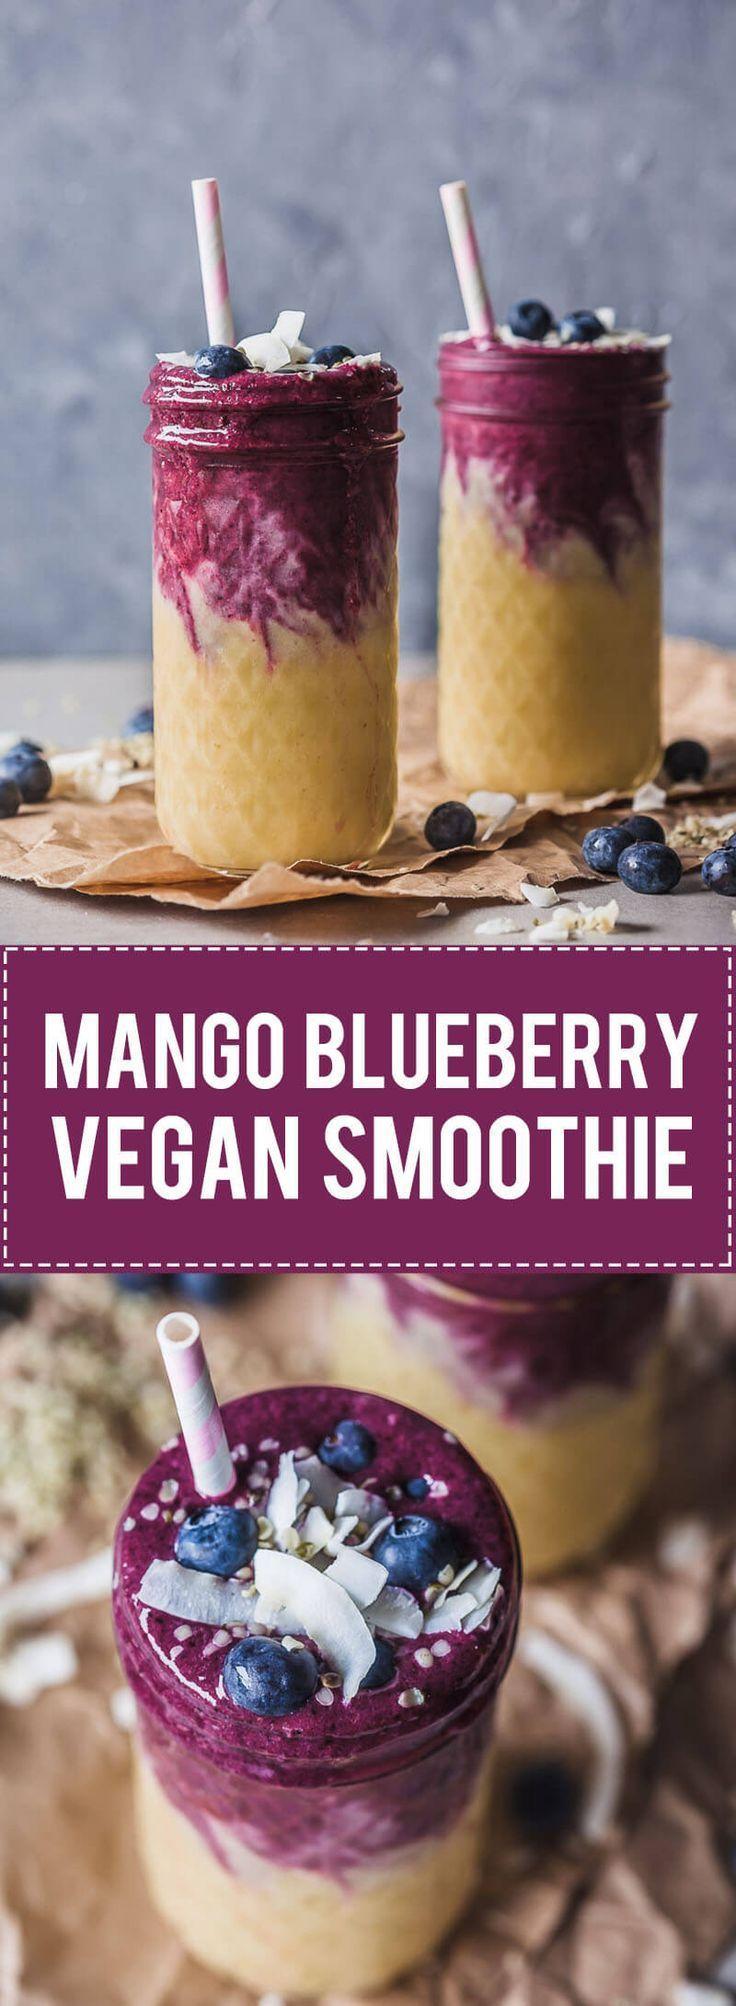 Mango Blueberry Smoothie {Vegan} - Vibrant Plate